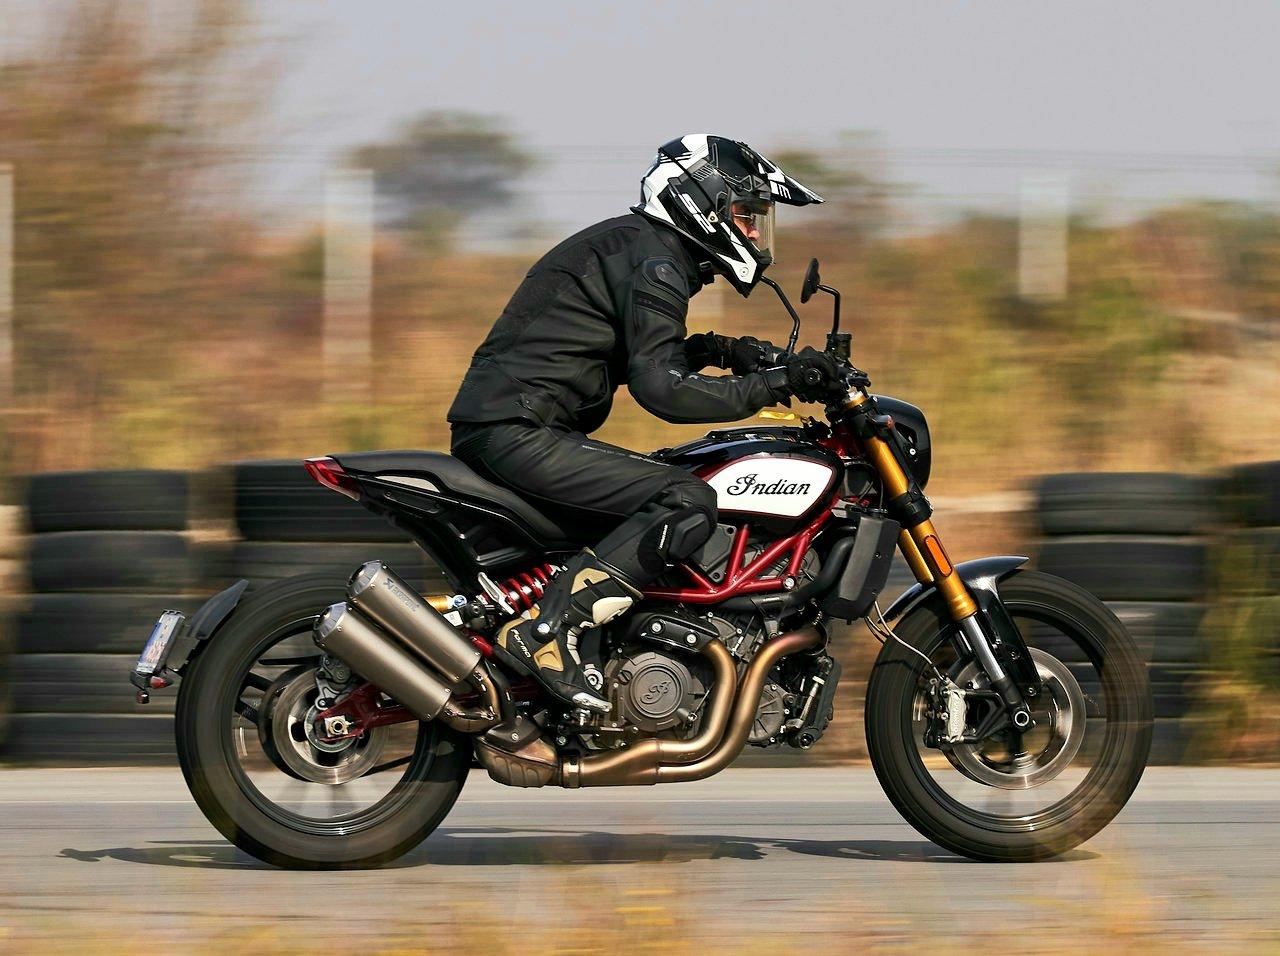 Indian FTR 1200 Race Replica